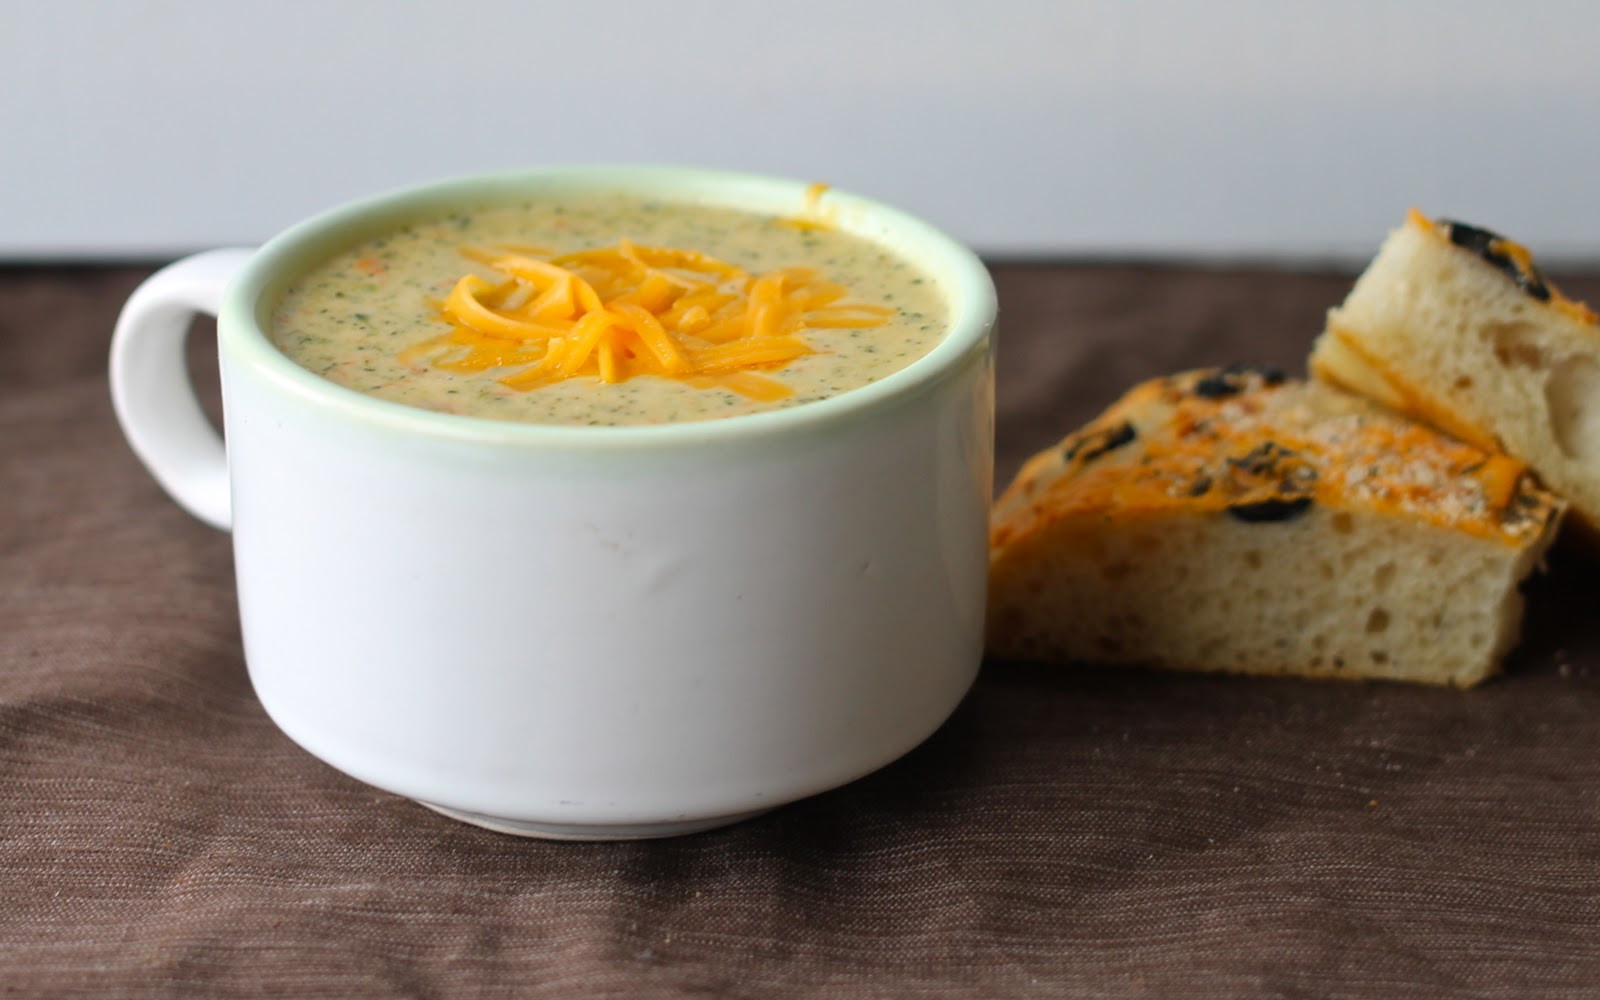 Panera Broccoli Cheddar Soup Recipe  Yammie s Noshery Broccoli Cheese Soup Panera Bread